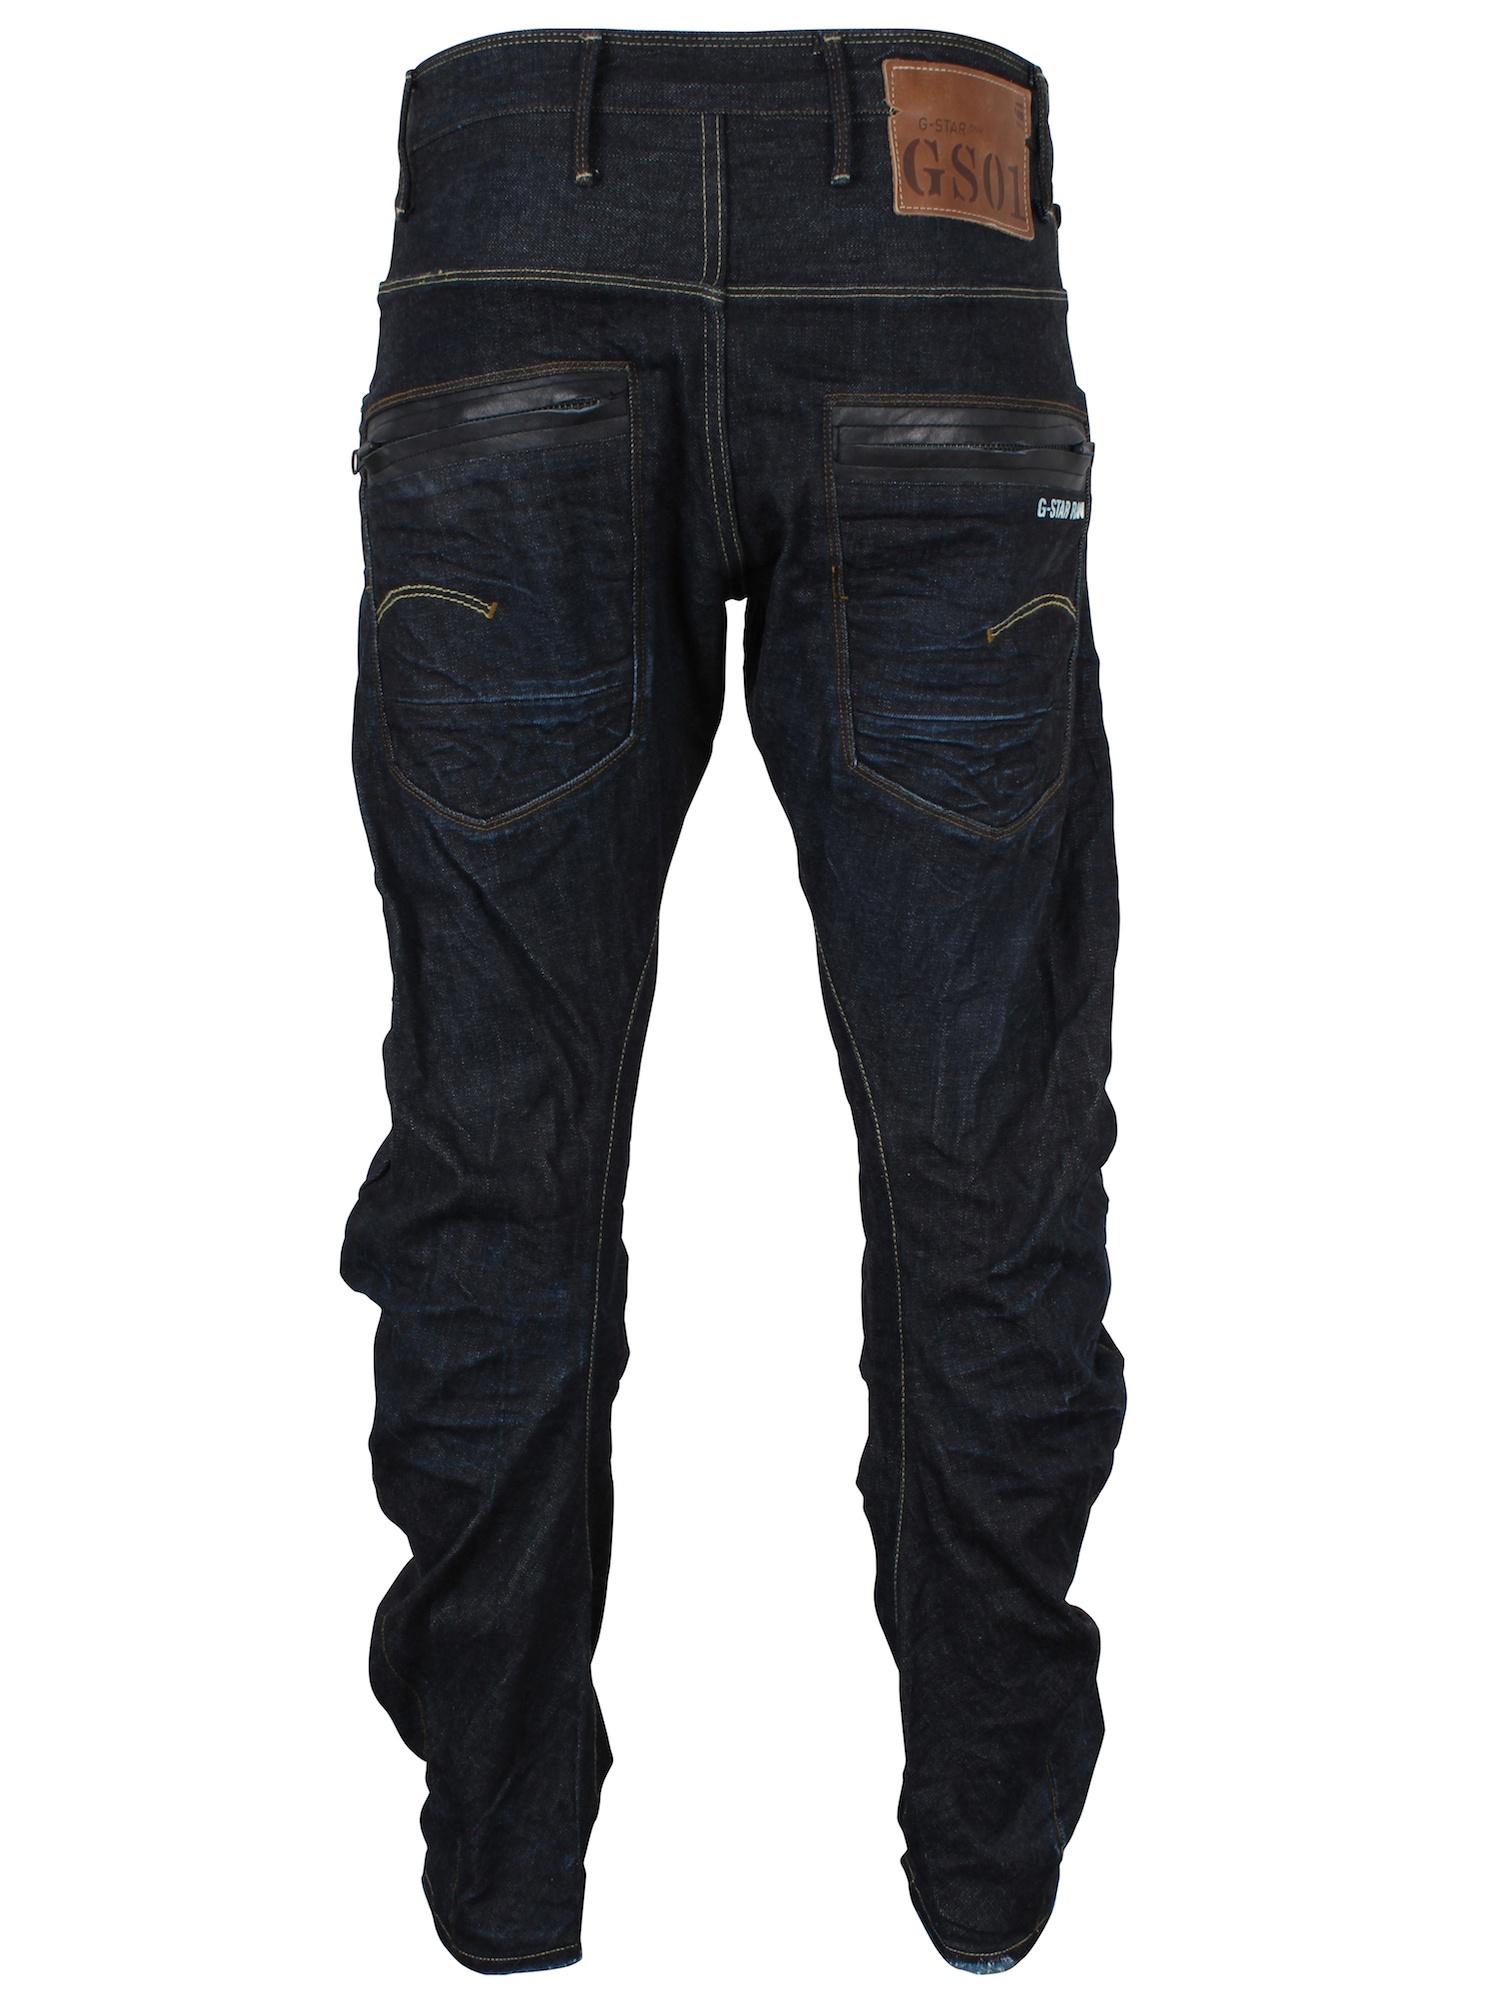 g star jeans riley loose tapered 3d raw wash loose fit tapered leg kruce denim ebay. Black Bedroom Furniture Sets. Home Design Ideas